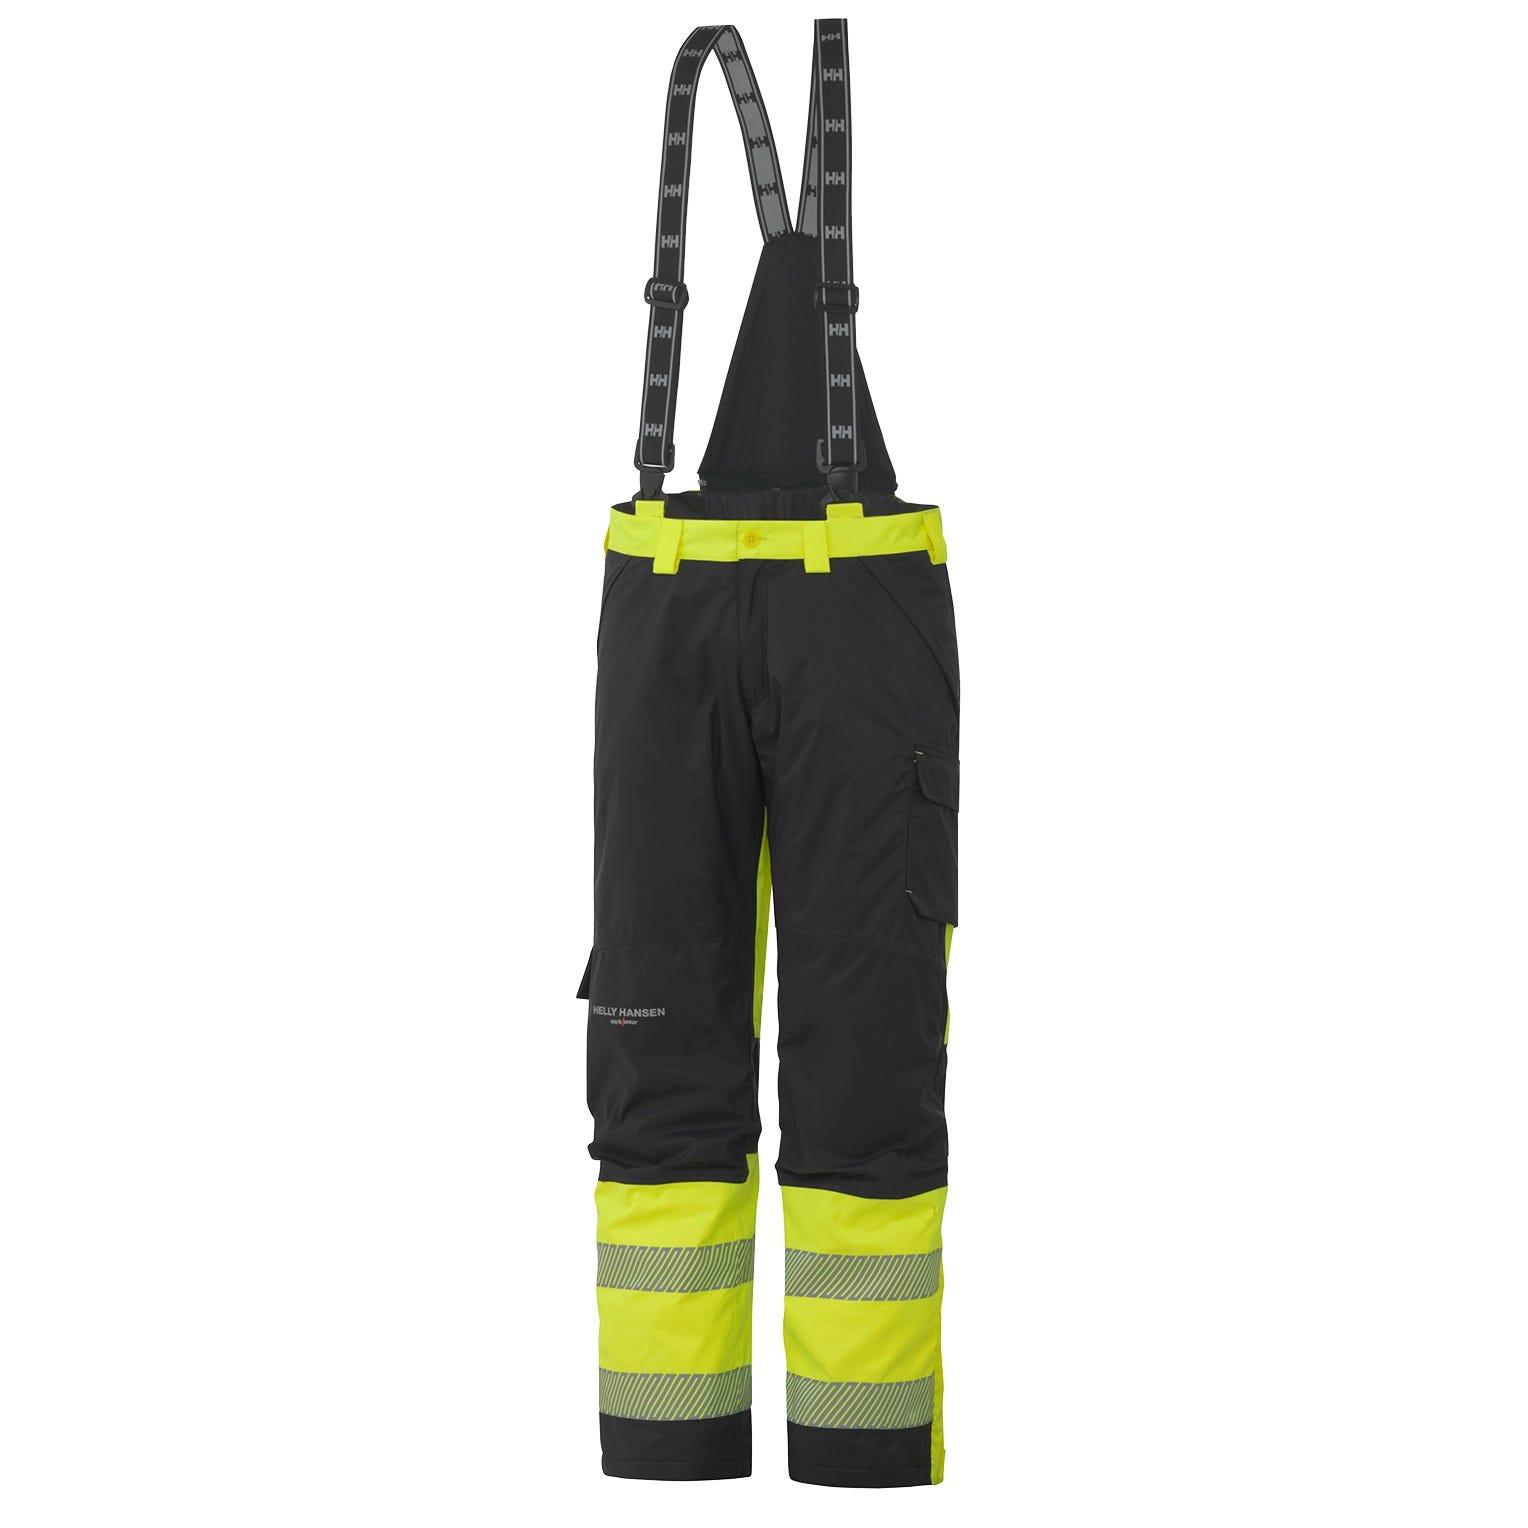 HH Workwear Workwear York Class 1 High Vis Insulated Work Bibs Yellow L